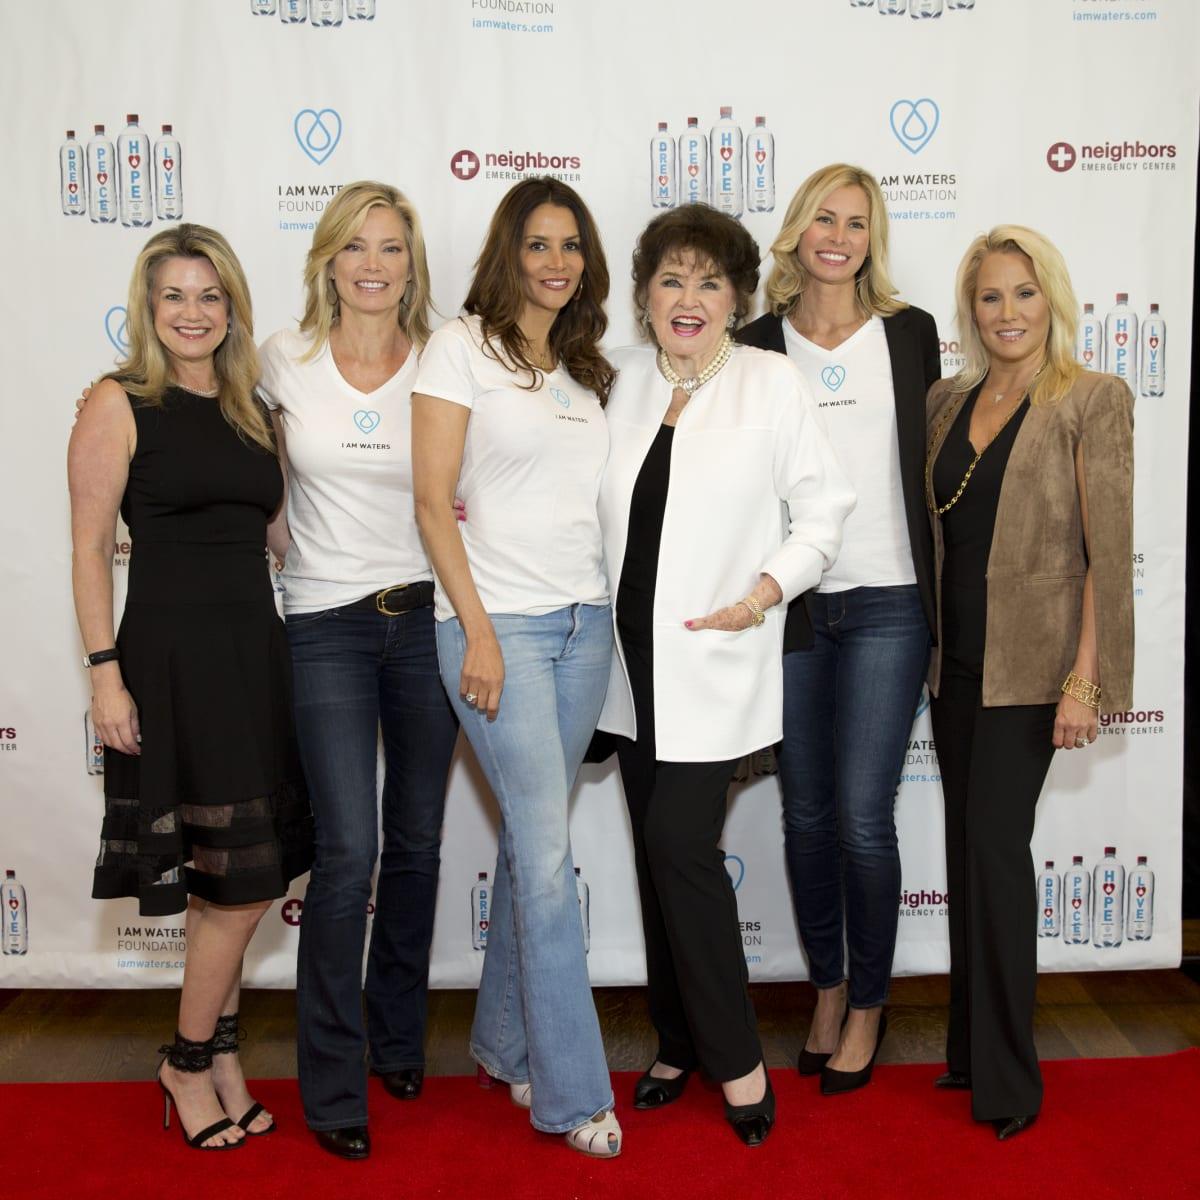 Houston, I Am Waters 5th Annual Supermodel Luncheon, May 2016, Millette Sherman, Kelly Emberg Kara Young, Warner Roberts, Niki Taylor, Jill Faucetta